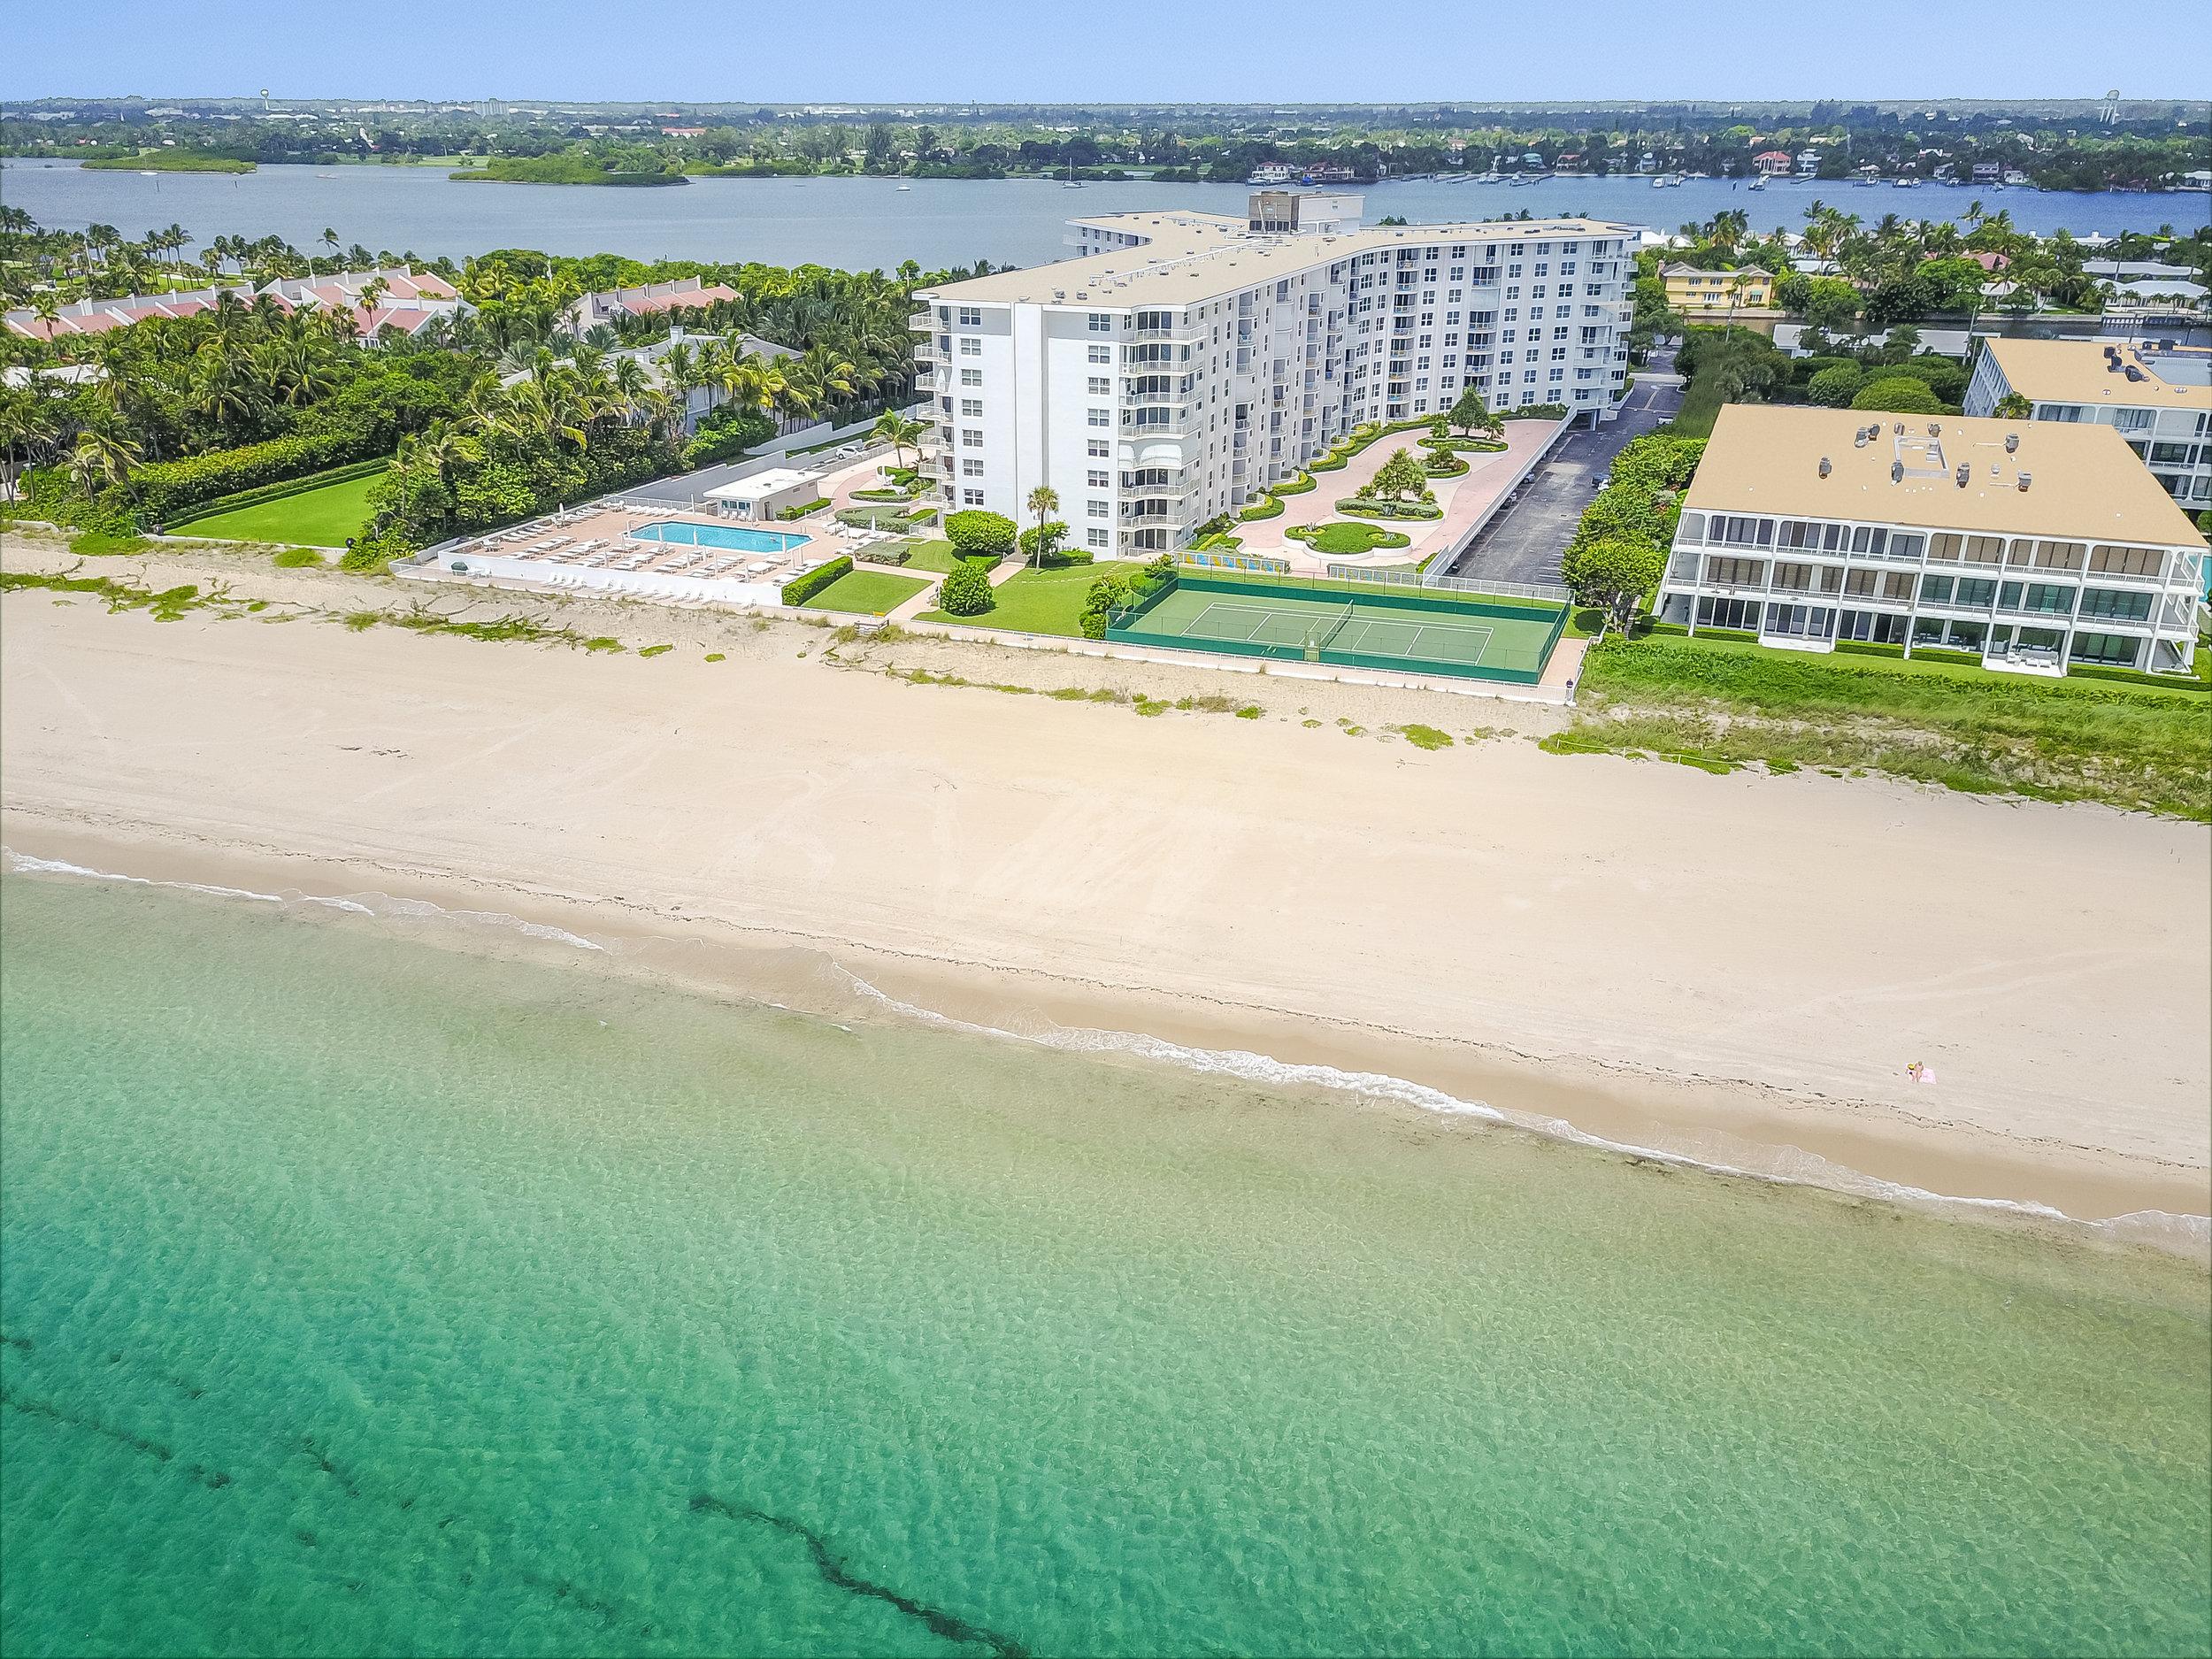 HARBOUR HOUSE   2295 S. Ocean Boulevard, No 219 Pam Beach, FL 33480